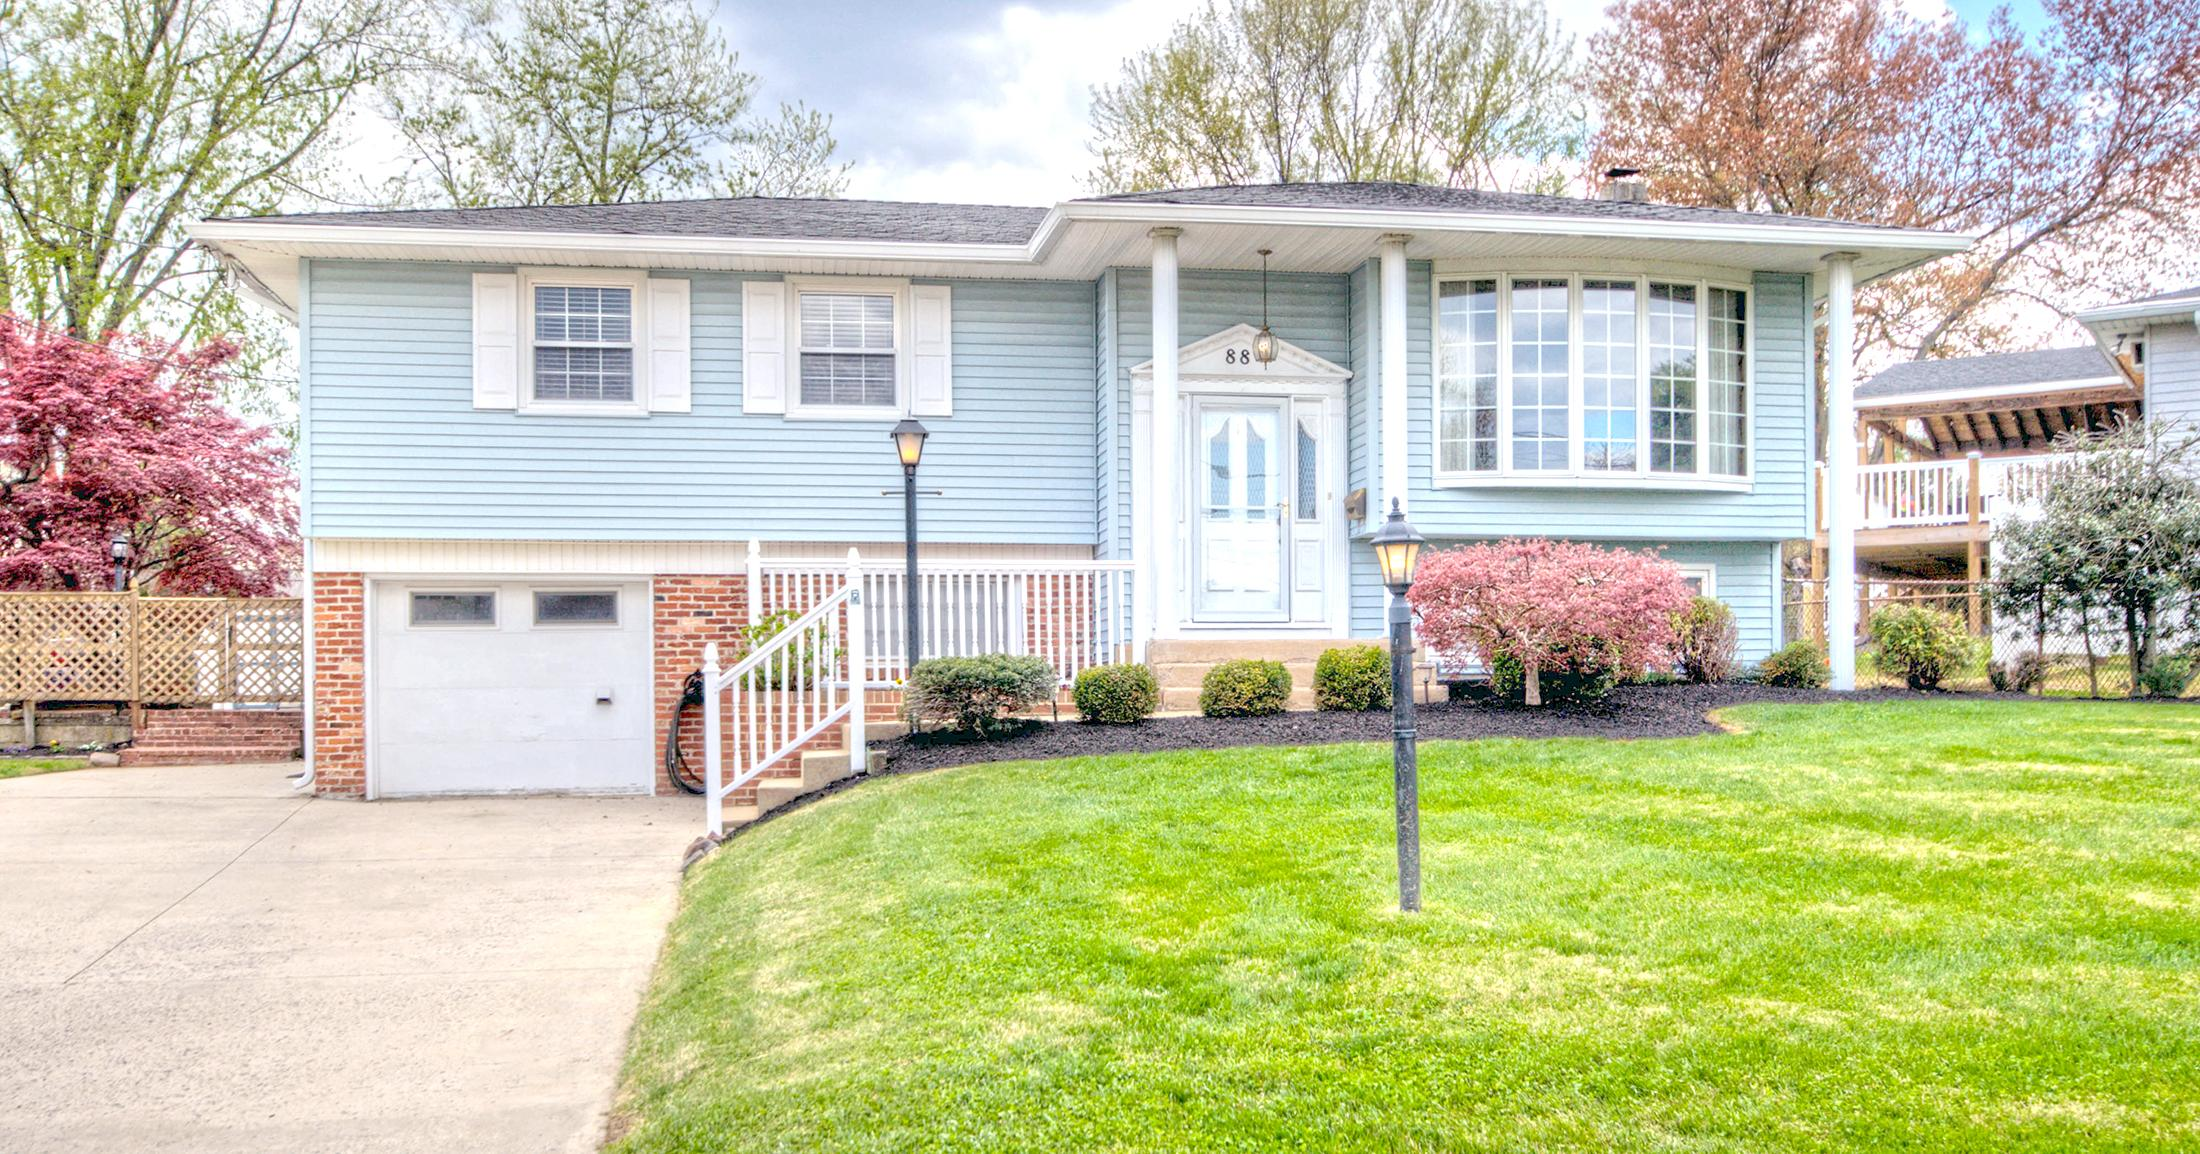 Property Image for 88 Princeton Drive